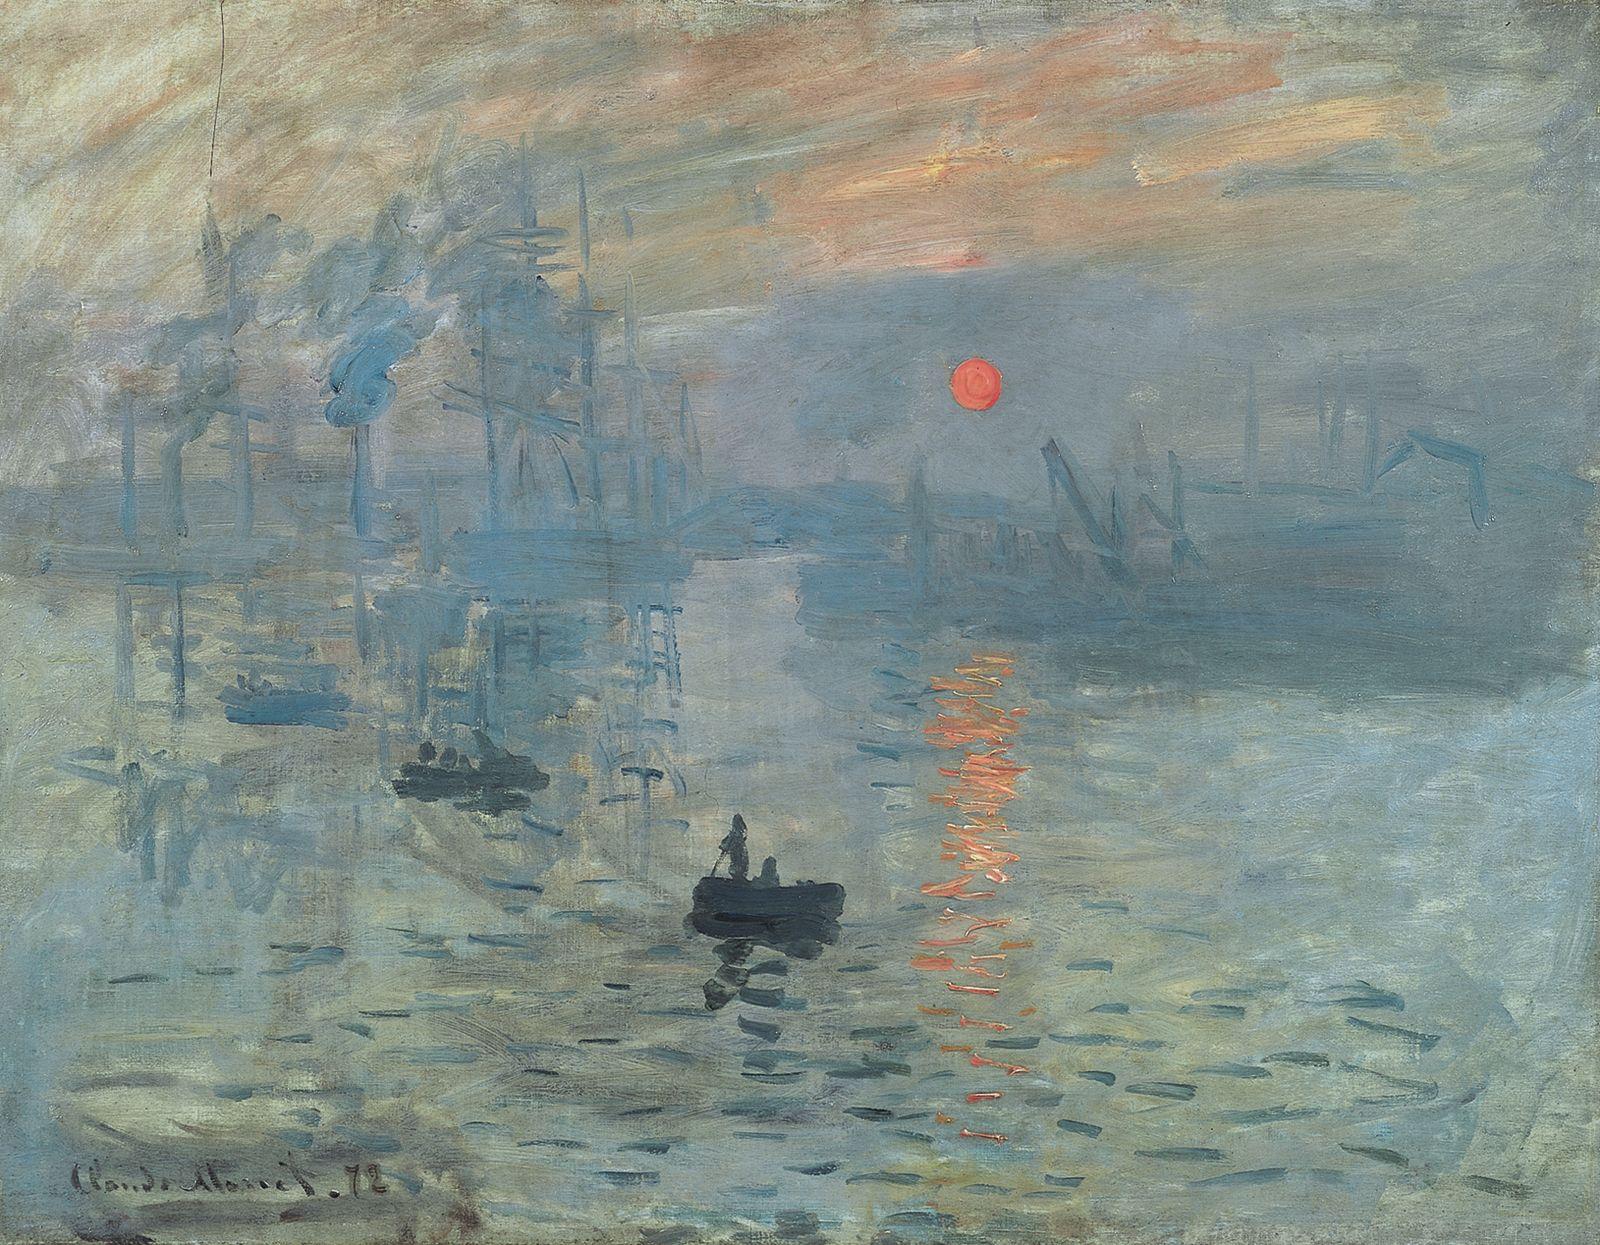 Claude Monet, Impresión, sol naciente (1872)